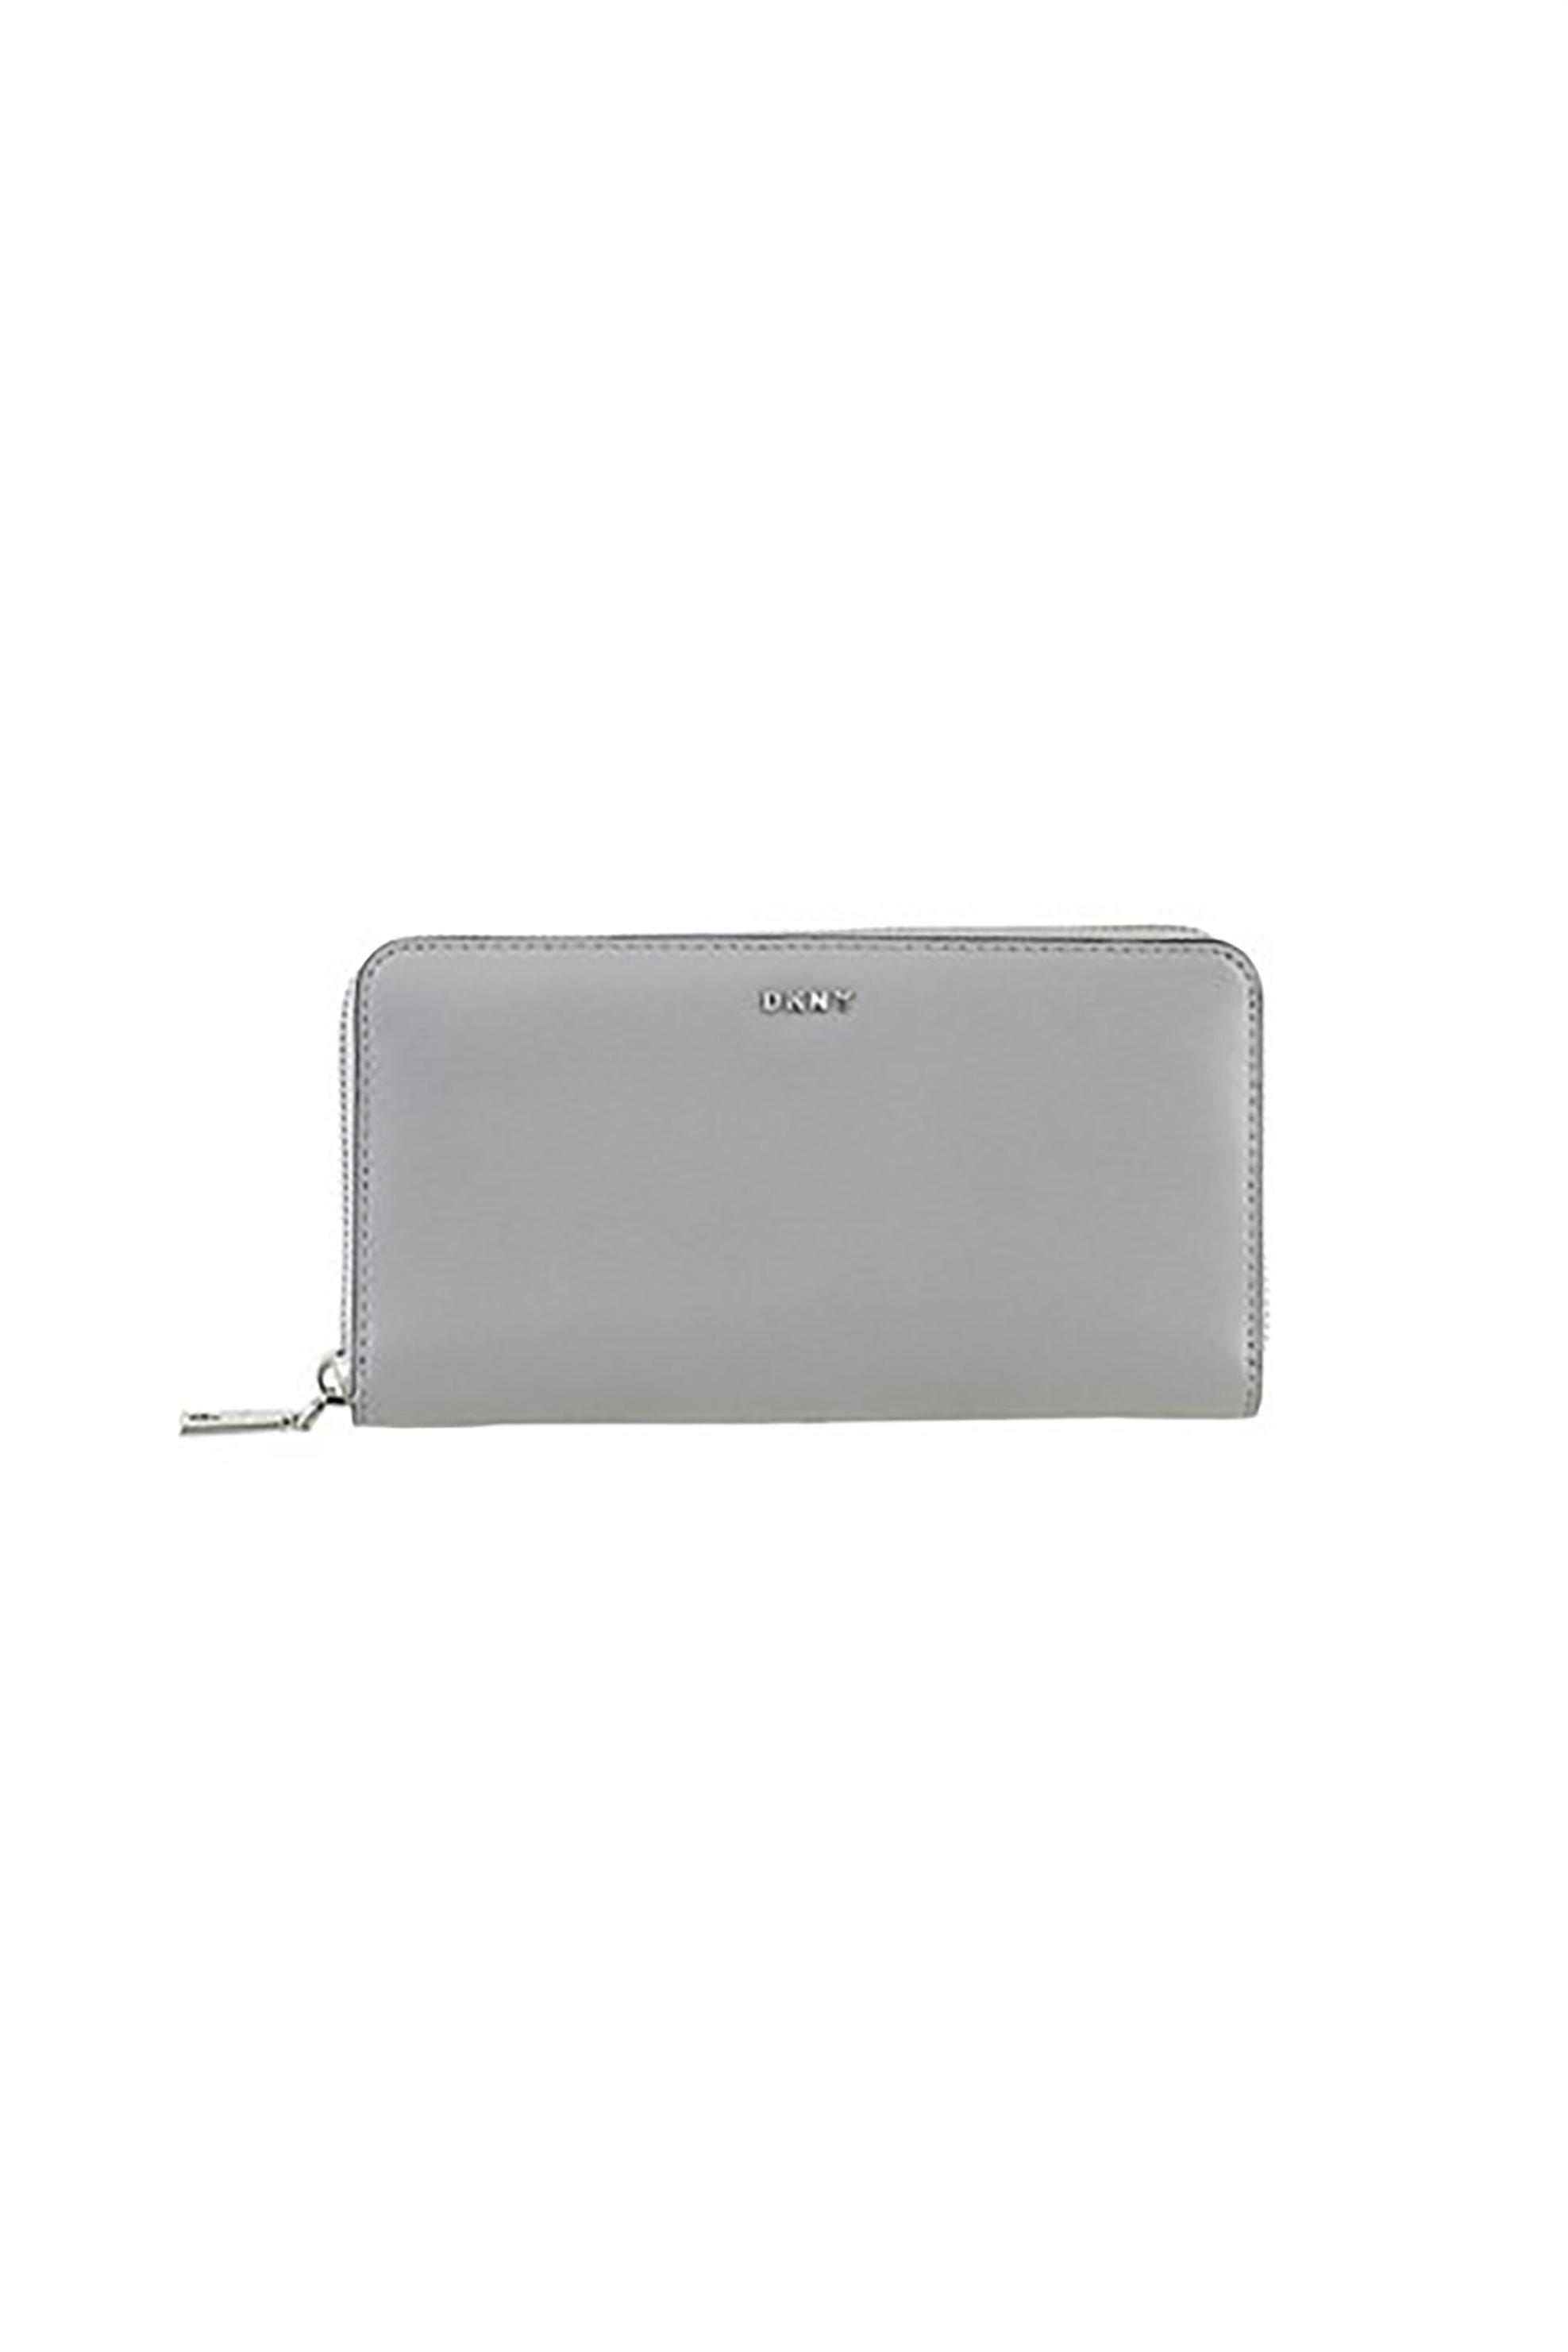 222966a460 Notos DKNY γυναικείο πορτοφόλι με εξωτερική τσέπη Βryant - R8313658 - Γκρι